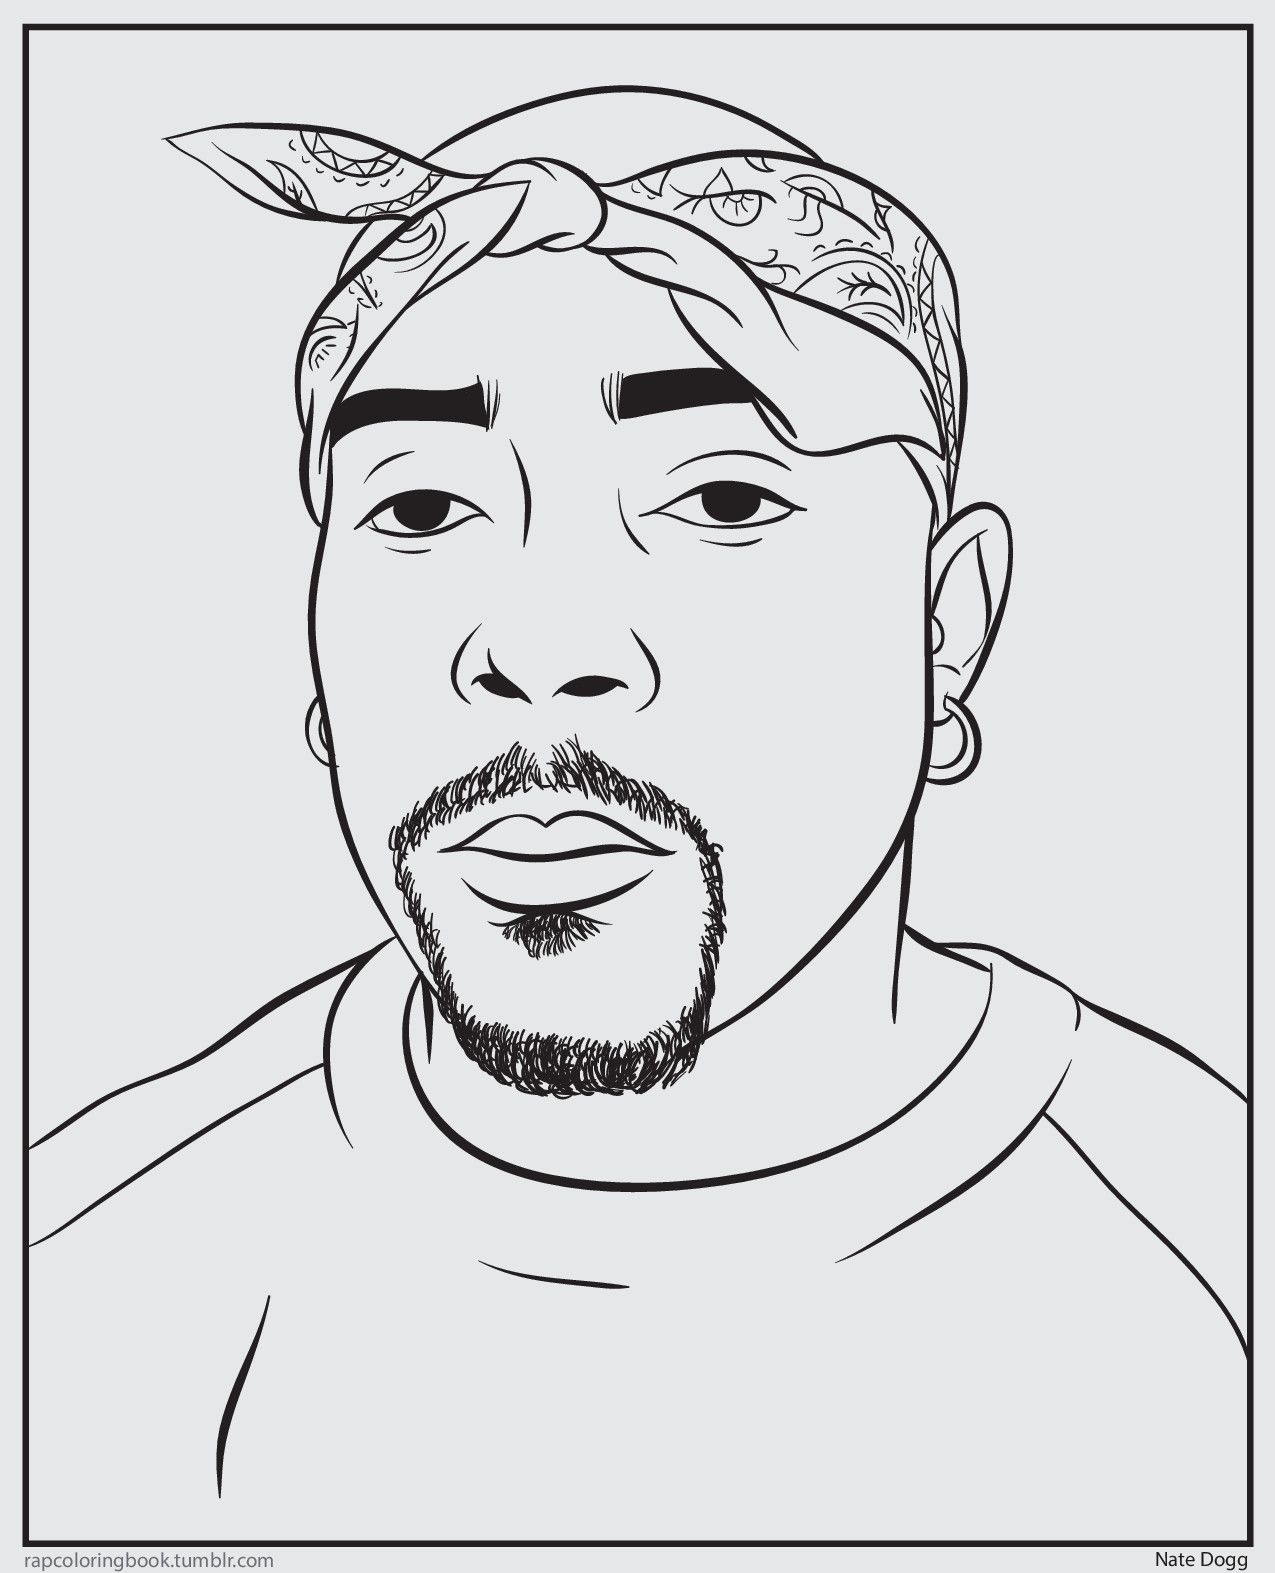 Bun B S Jumbo Coloring And Rap Activity Tumblr Click Here To Download The Nate Dogg Coloring Nate Dogg Art Nate Dogg Hip Hop Art